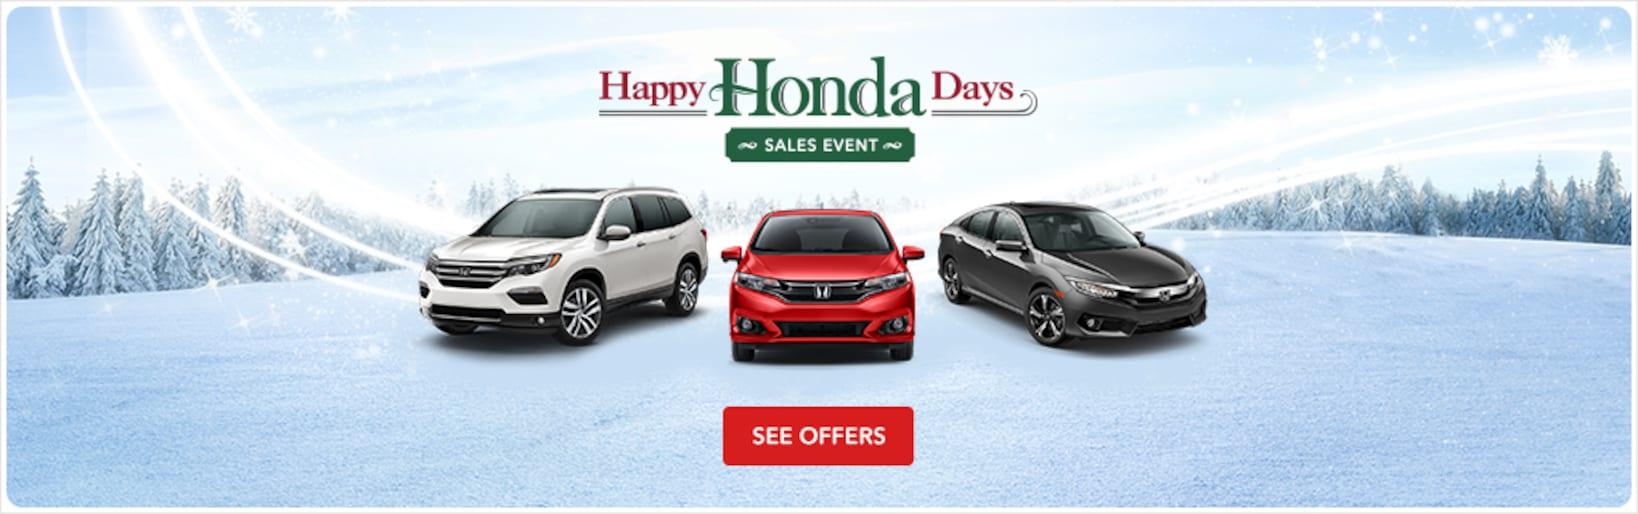 Dch honda of temecula new used honda dealership for Honda escondido service